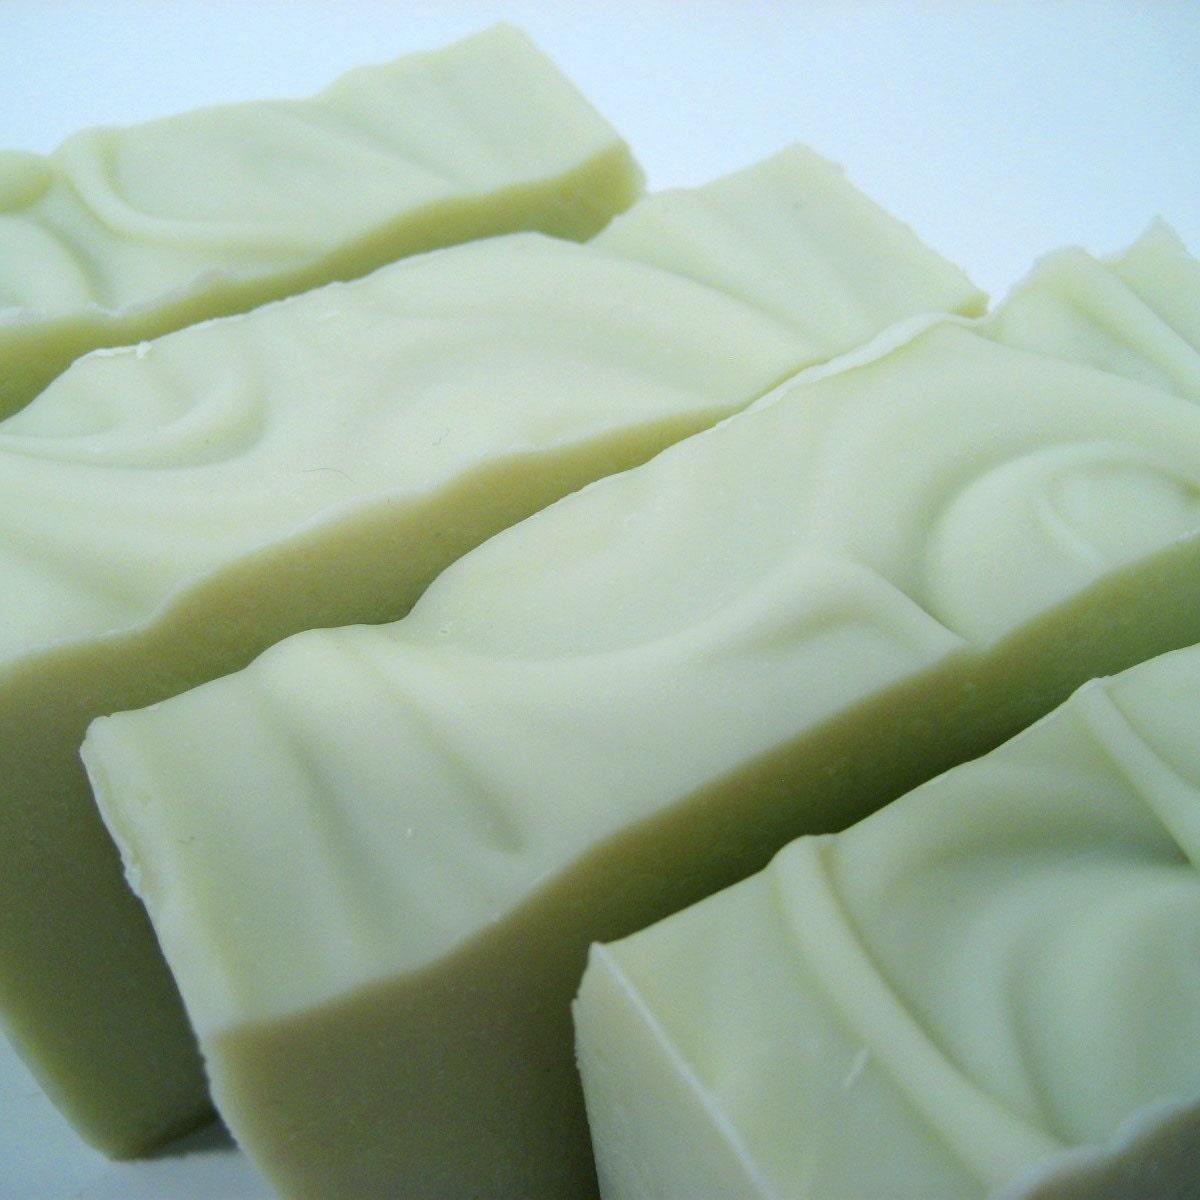 Cucumber & Aloe . Shea Butter Soap . Vegan . Green . Fresh . Clean